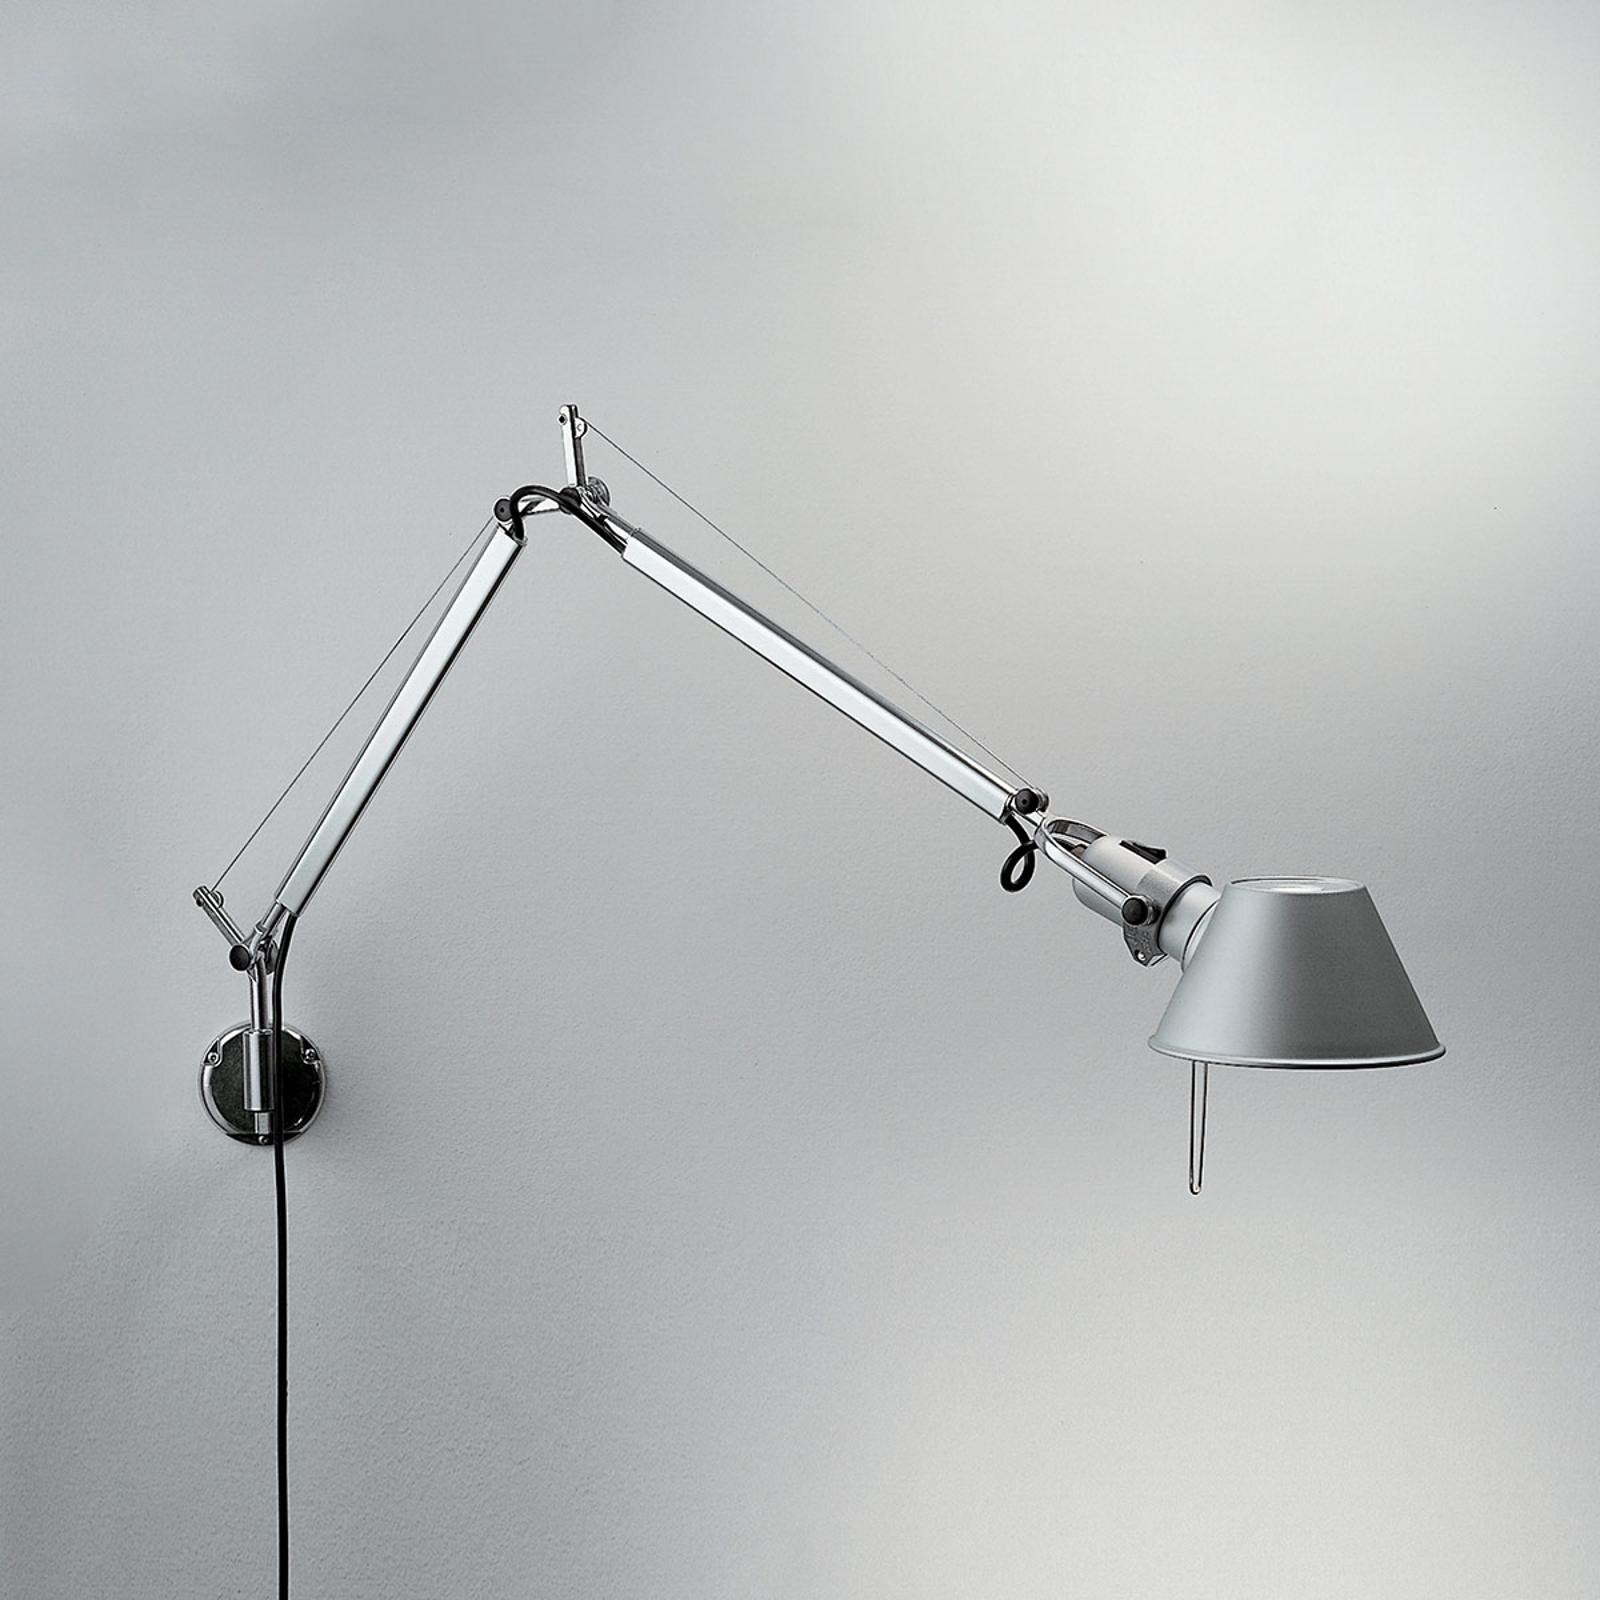 Artemide Tolomeo Mini kinkiet LED 3000 K